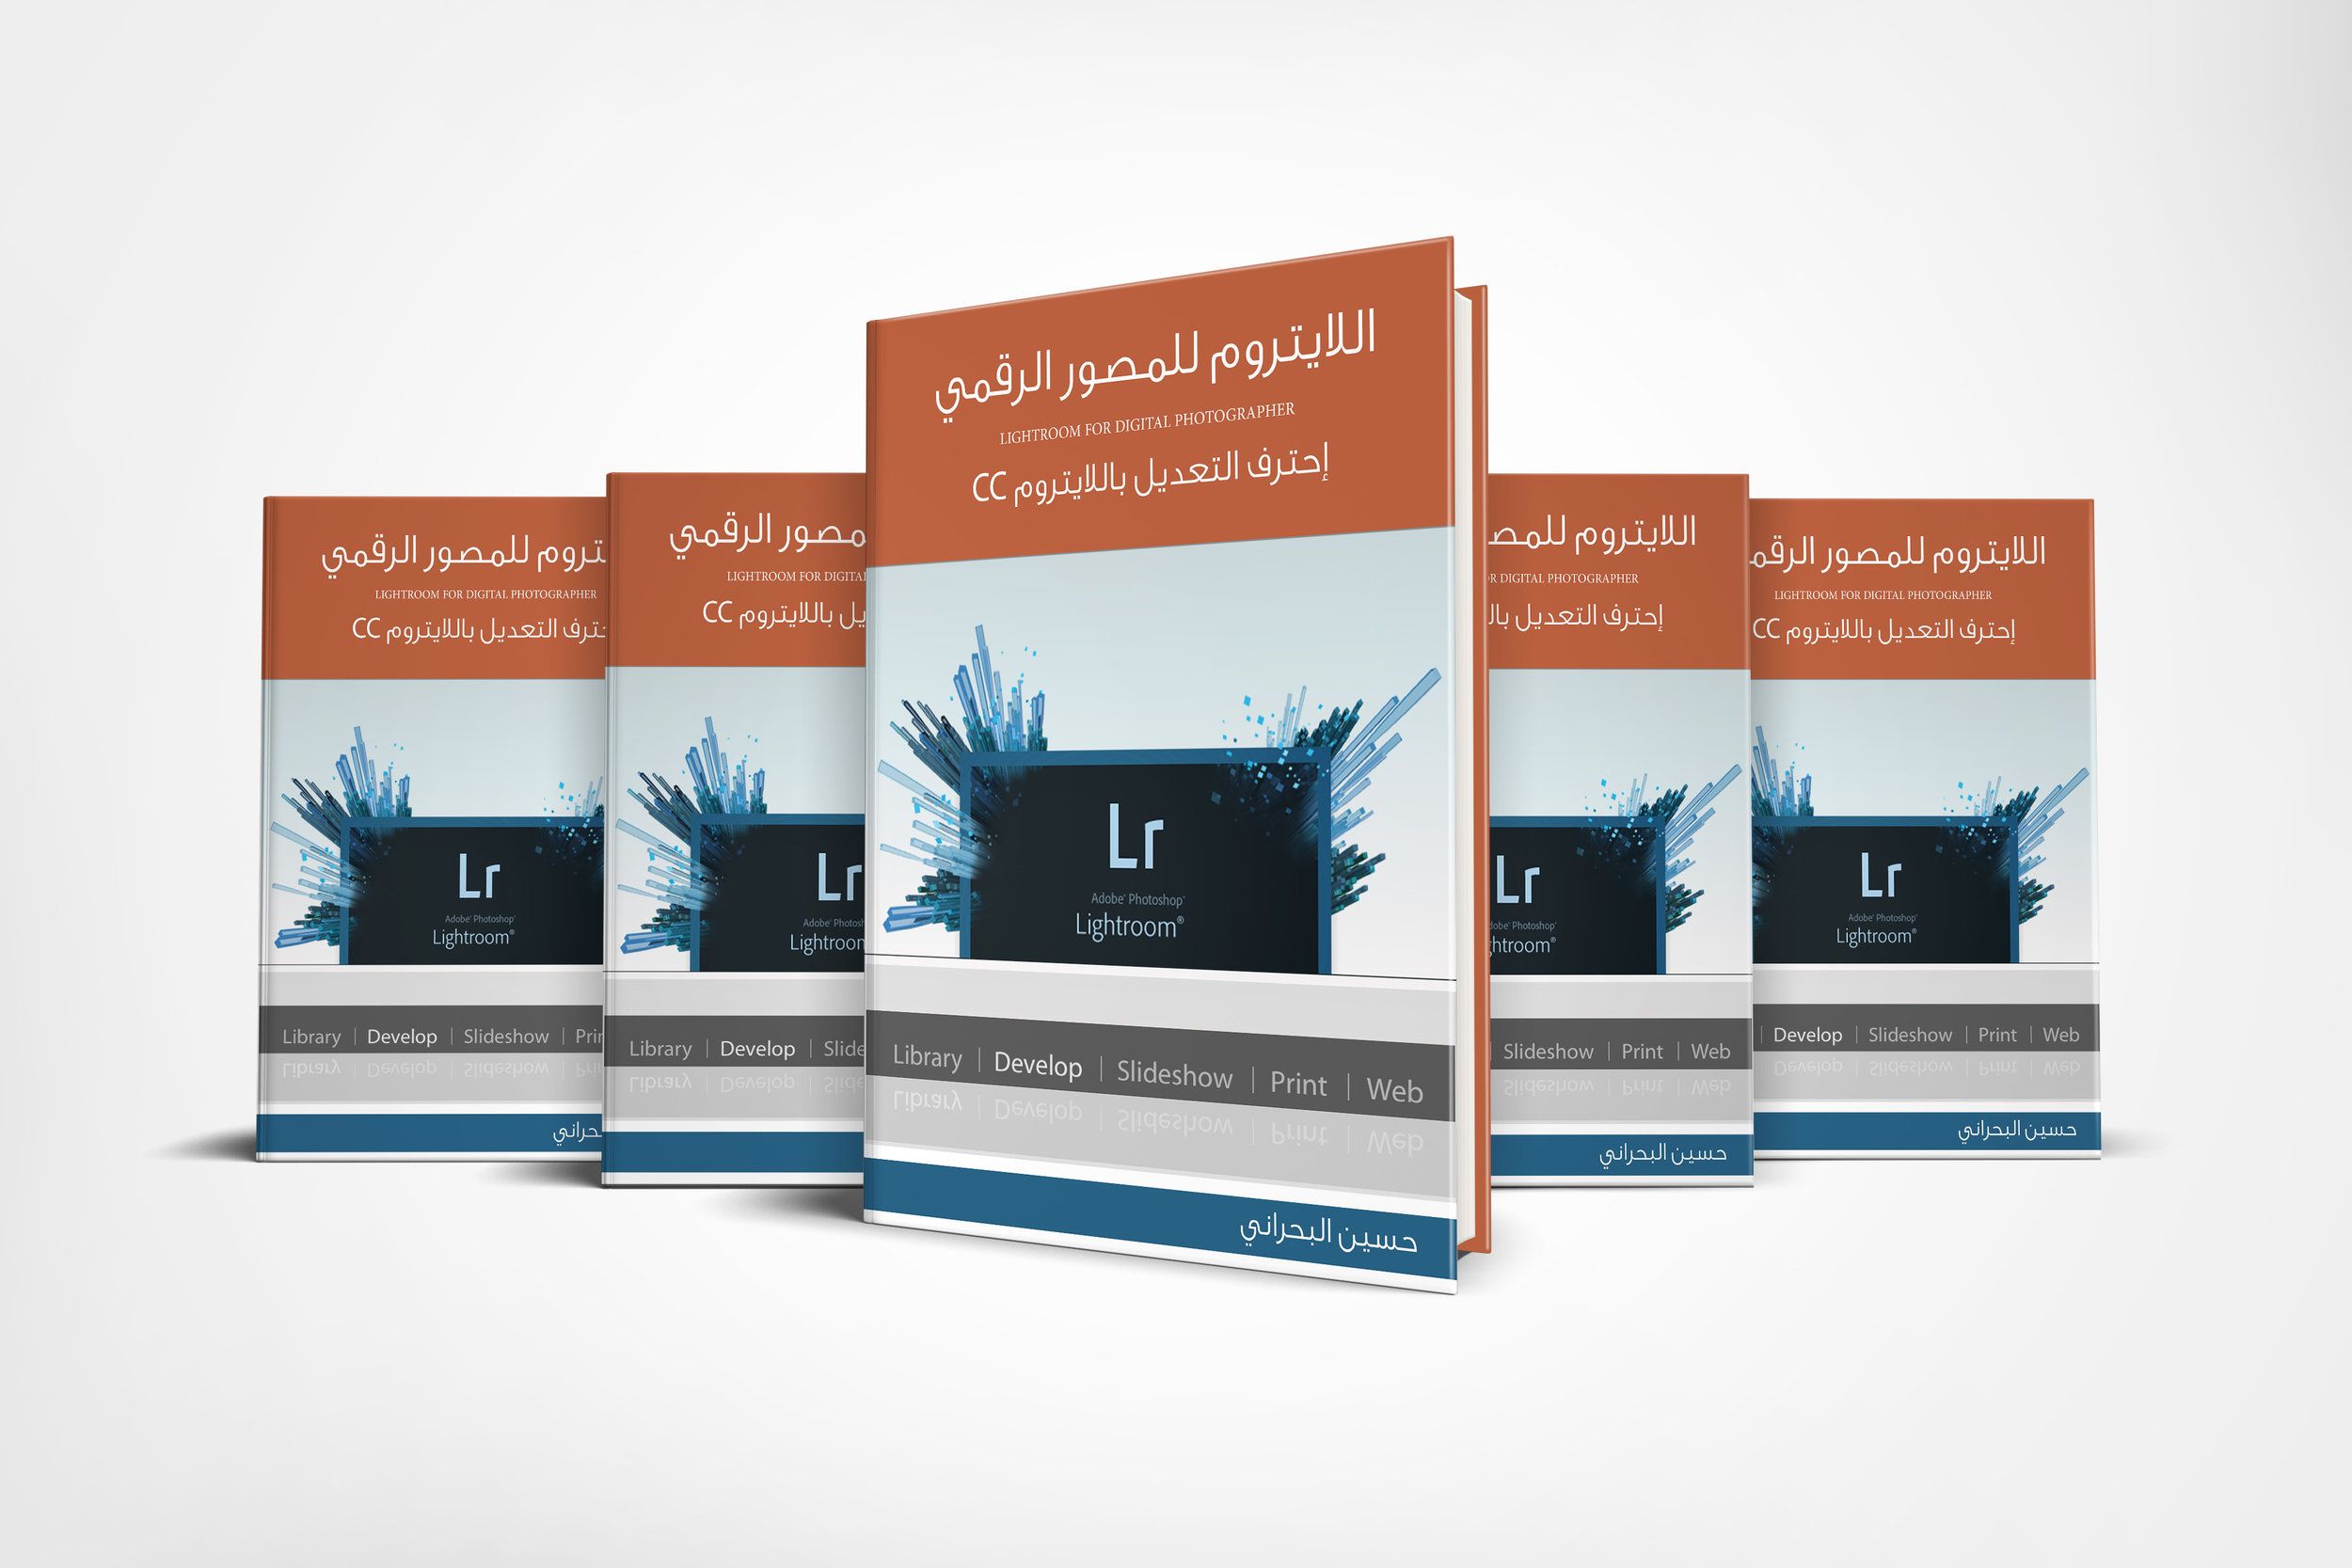 077-6x9-Book-Series-Presentation-COVERVAULT.jpg